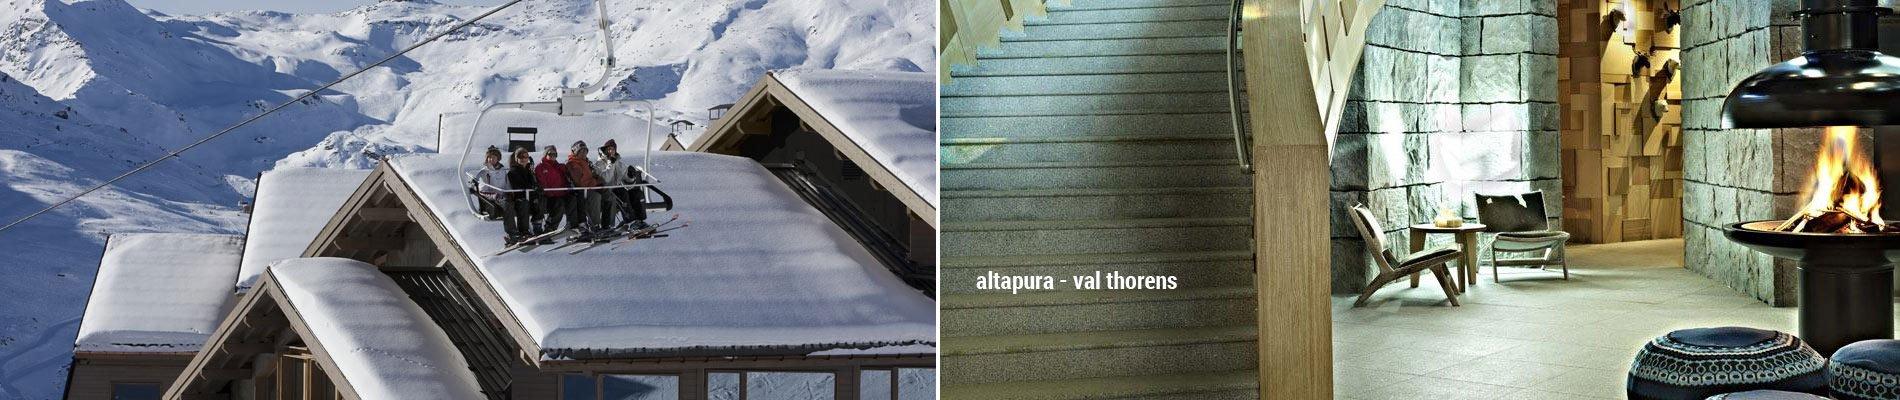 hotel-altapura-sibuet-val-thorens-les-3-vallees-frankrijk-wintersport